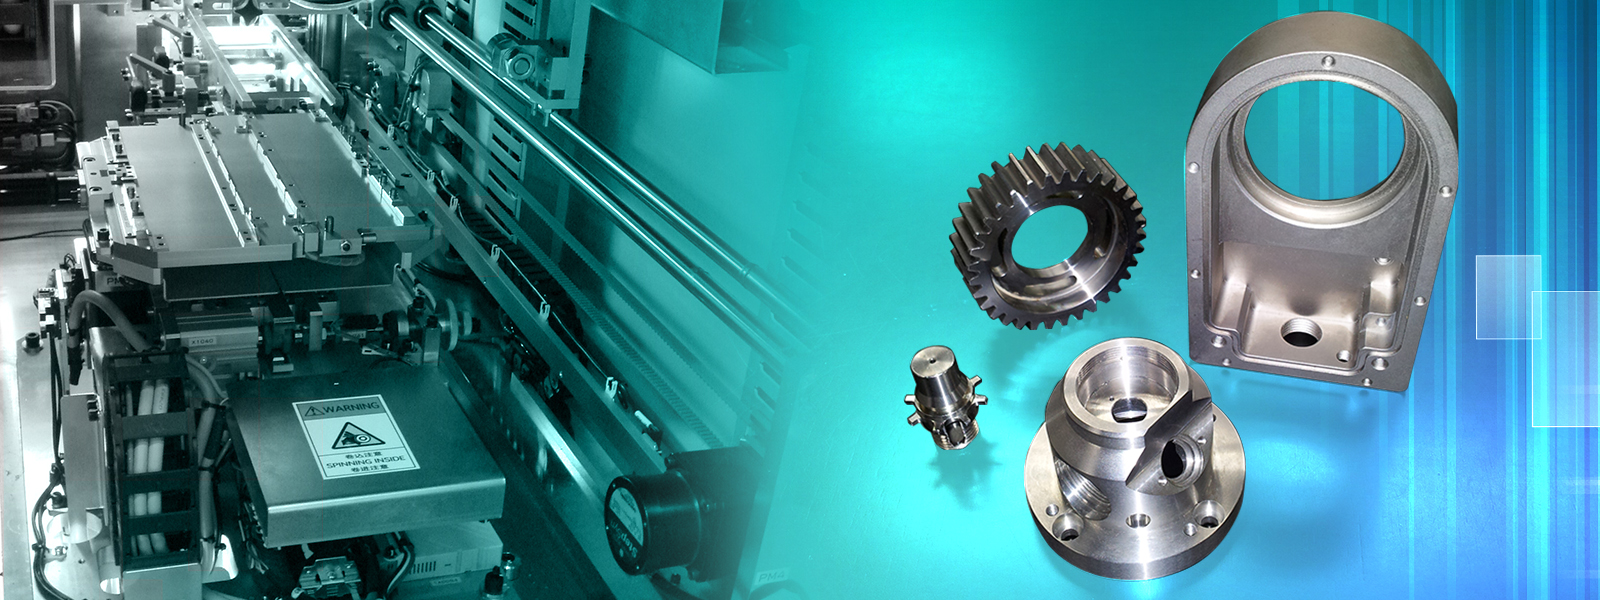 Fabrication of Machine Parts